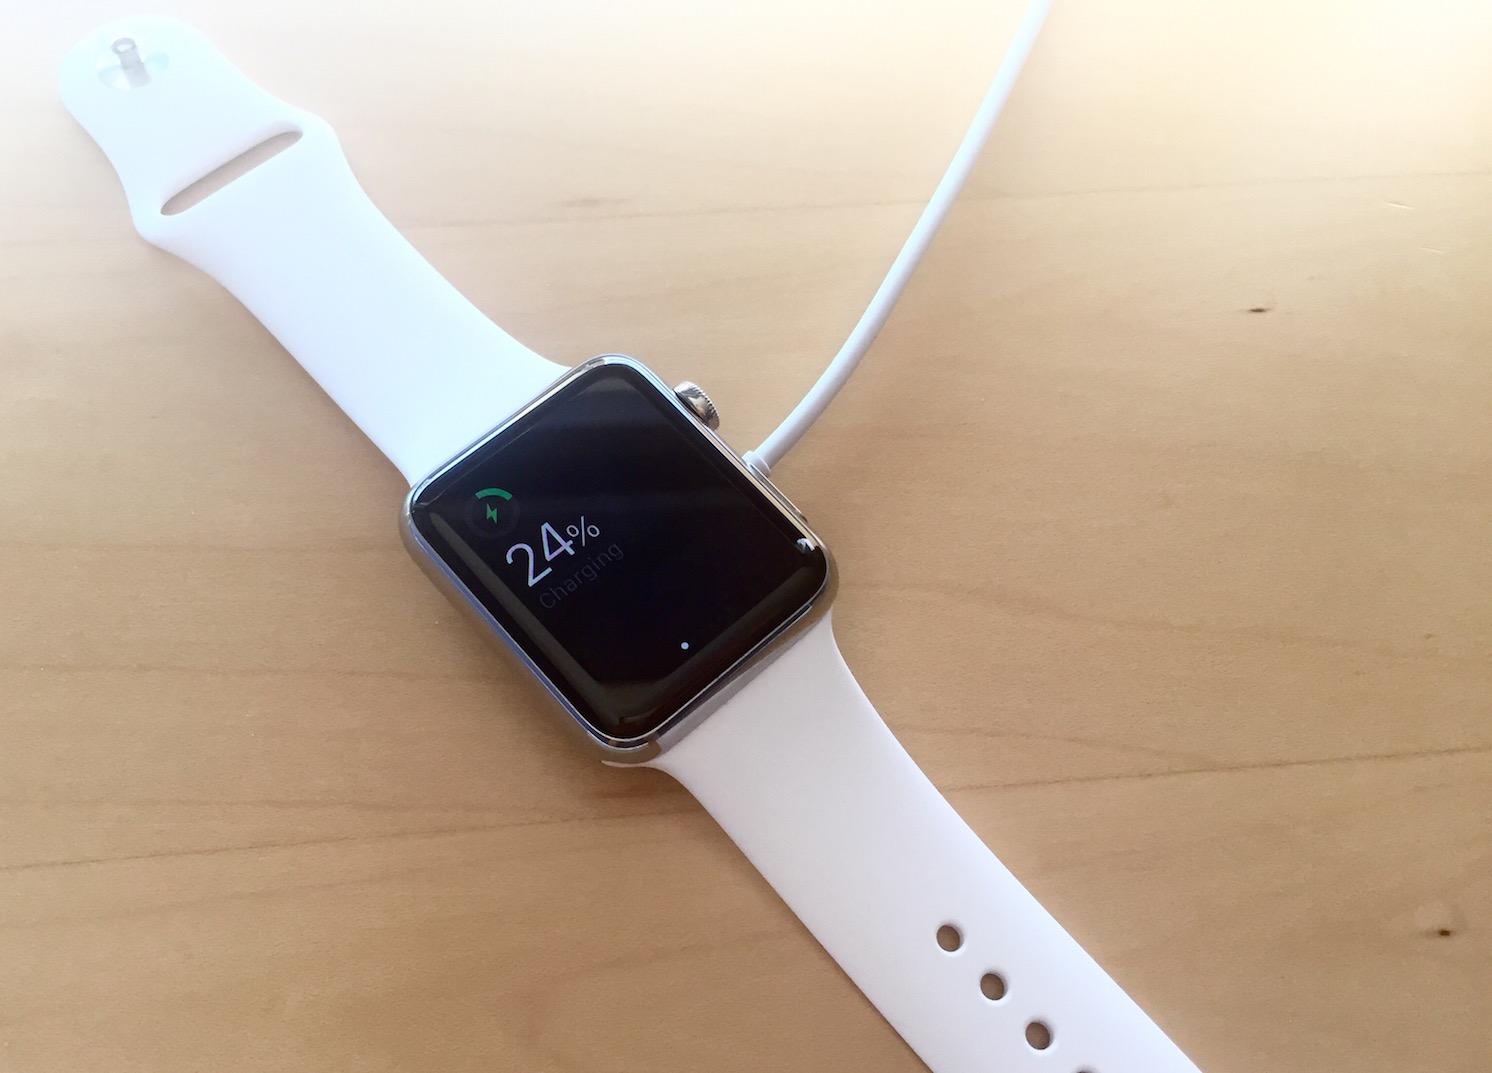 Apple Watch charging on desk